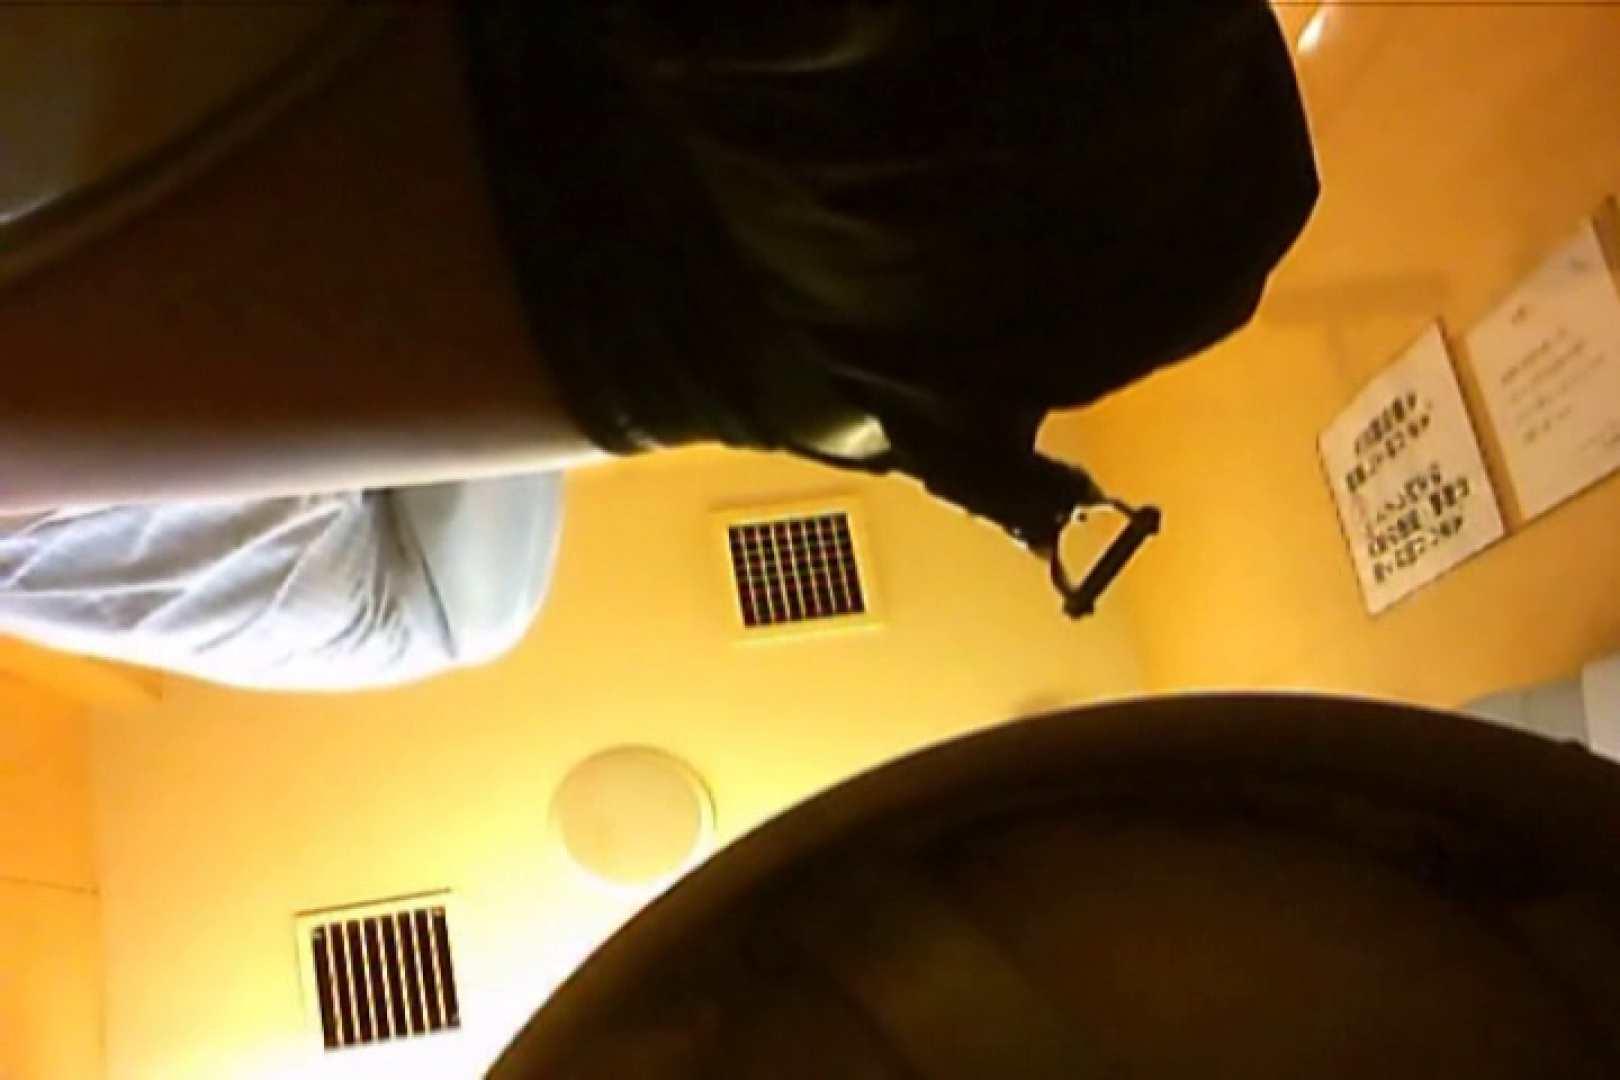 SEASON 2ND!掴み取りさんの洗面所覗き!in新幹線!VOL.03 念願の完全無修正 ゲイ射精画像 84連発 22